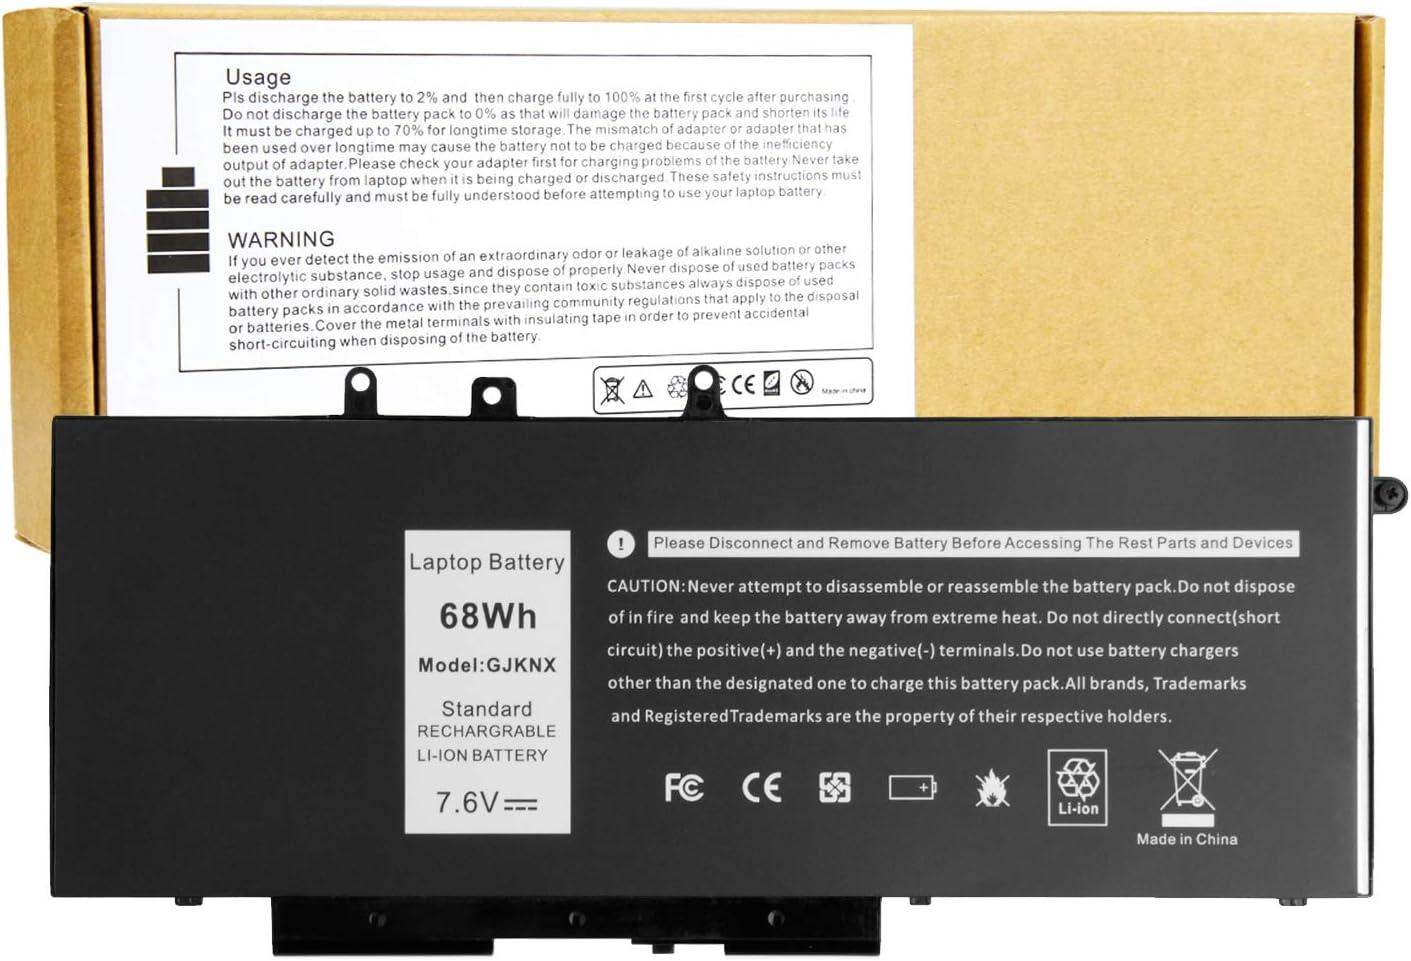 GJKNX Laptop Battery for Dell Latitude 5480 5580 5280 5590 5490 E5480 E5580 E5490 E5590 Precision 15 3520 3530 Series DY9NT 0DY9NT GD1JP 0GD1JP 5YHR4 451-BBZG - 68Wh